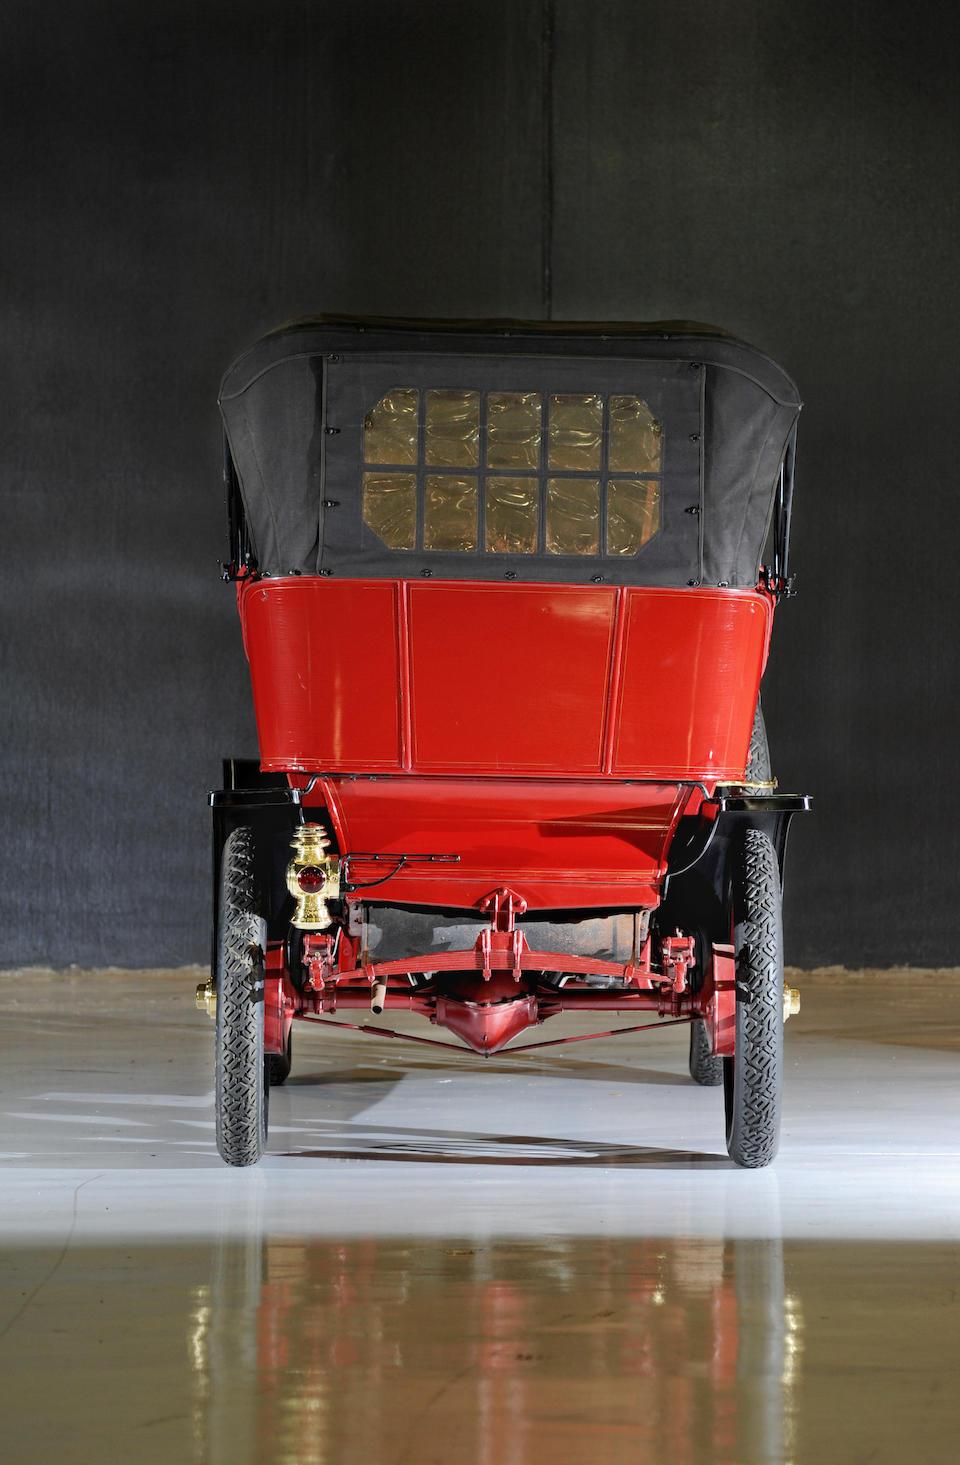 Ex-Dr. Samuel L. Scher, Richard Paine, and John M. O'Quinn,1906 American Tourist Roi-des-Belges Touring Car  Chassis no. 1783